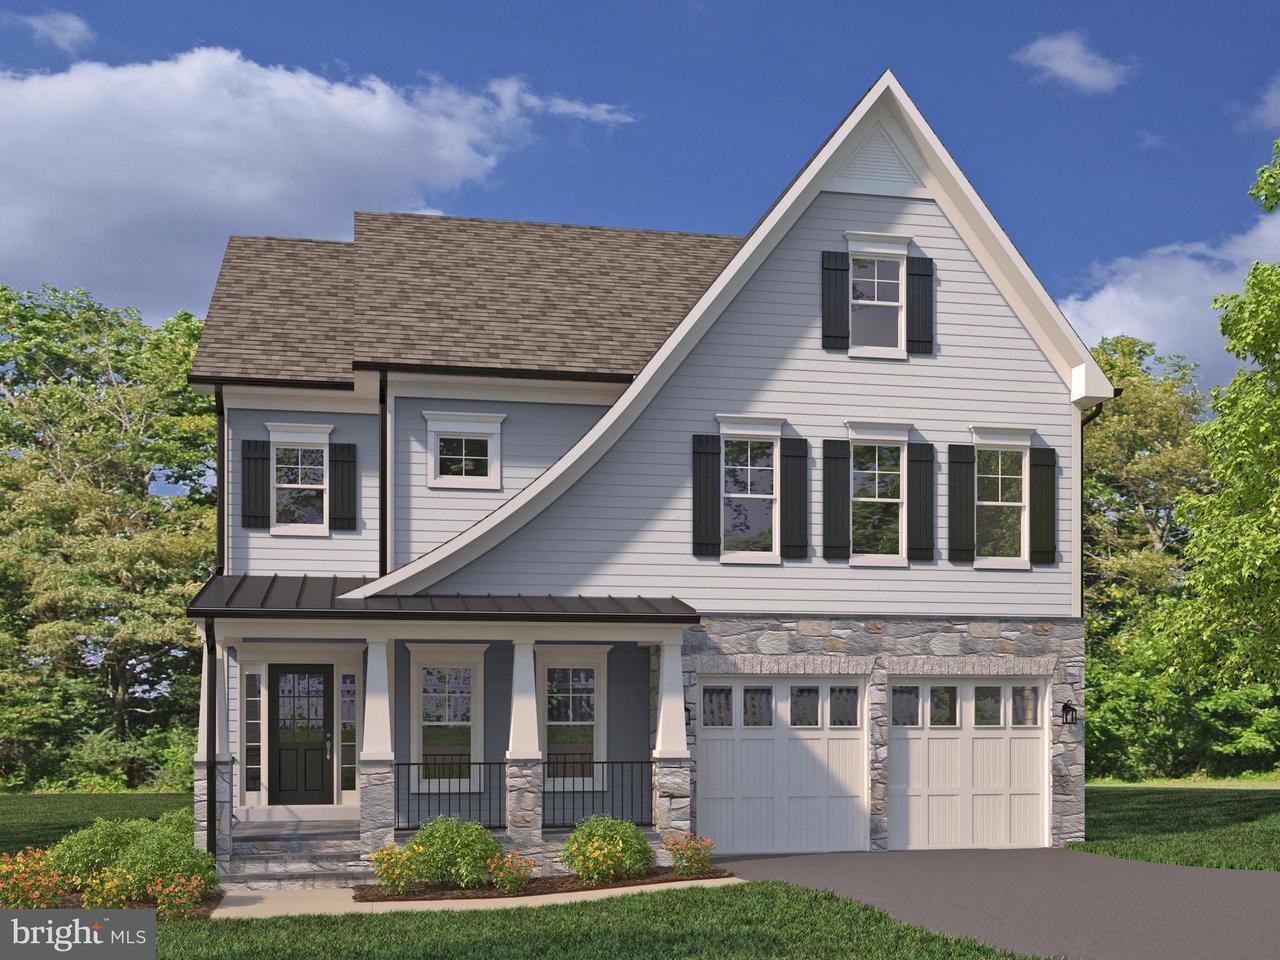 Single Family Home for Sale at 2314 LEXINGTON 2314 LEXINGTON Arlington, Virginia 22205 United States